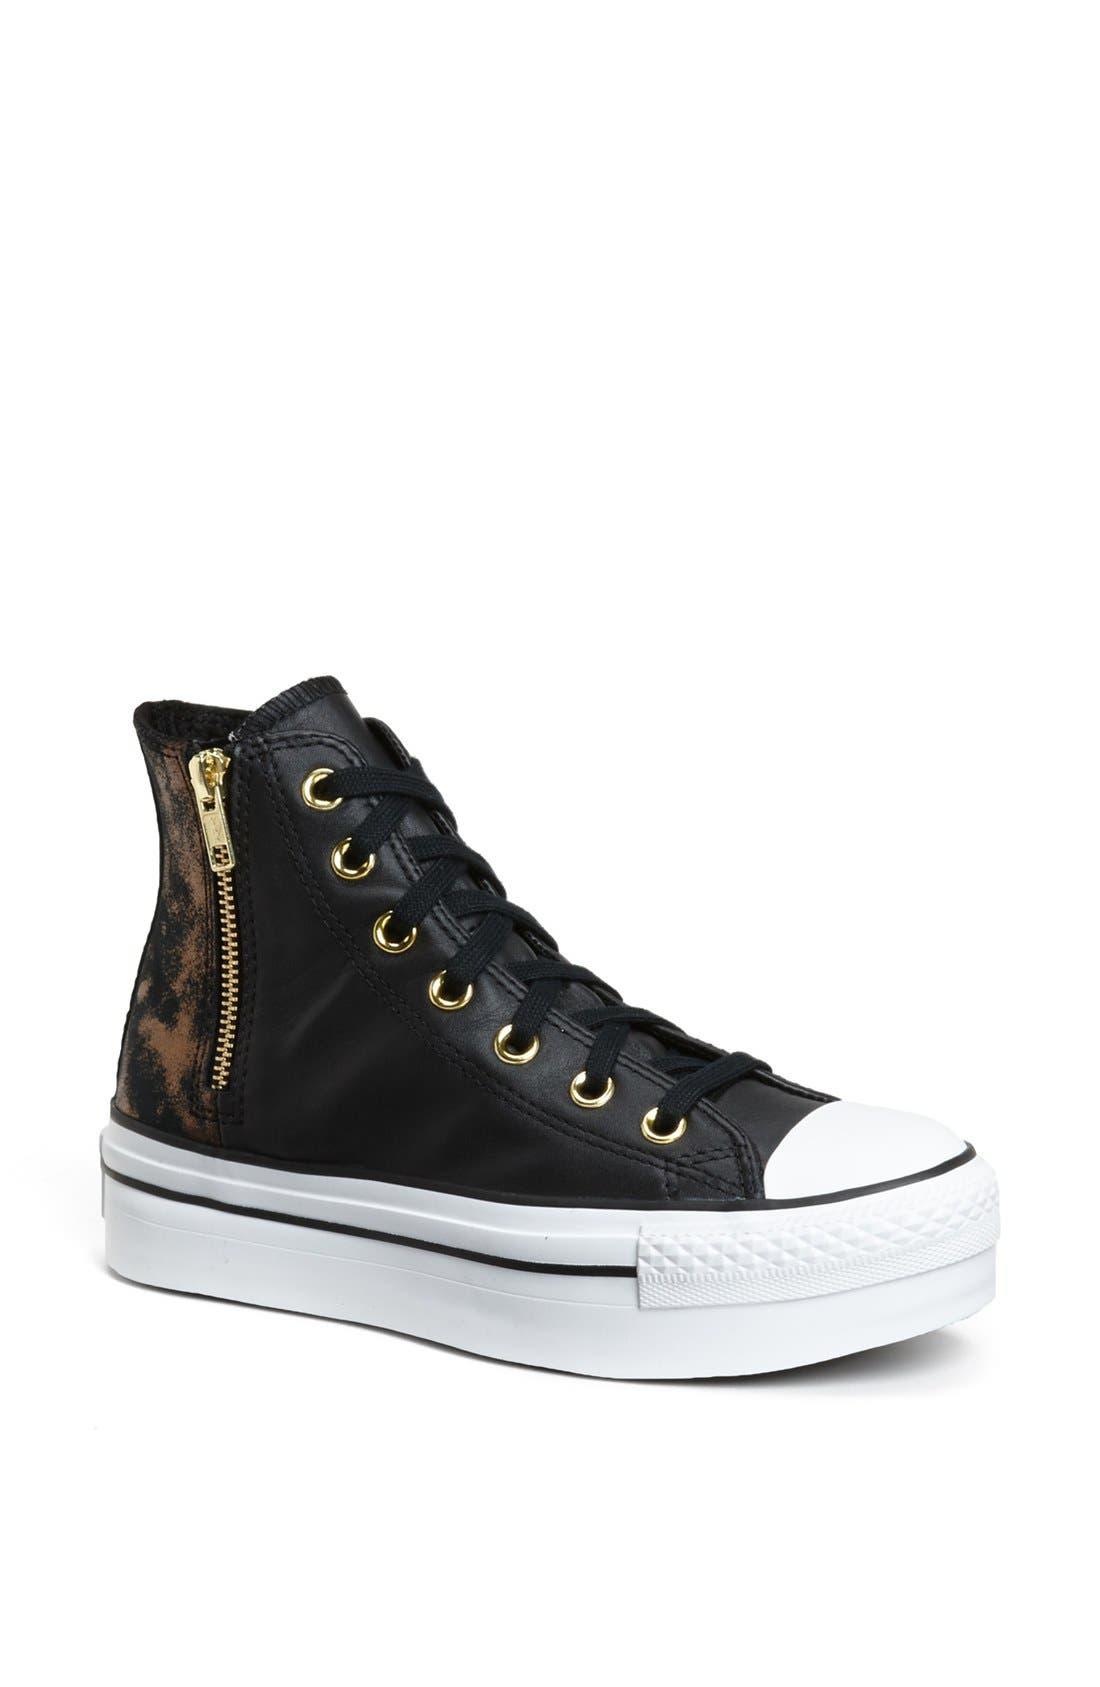 Alternate Image 1 Selected - Converse High Top Platform Sneaker (Women)